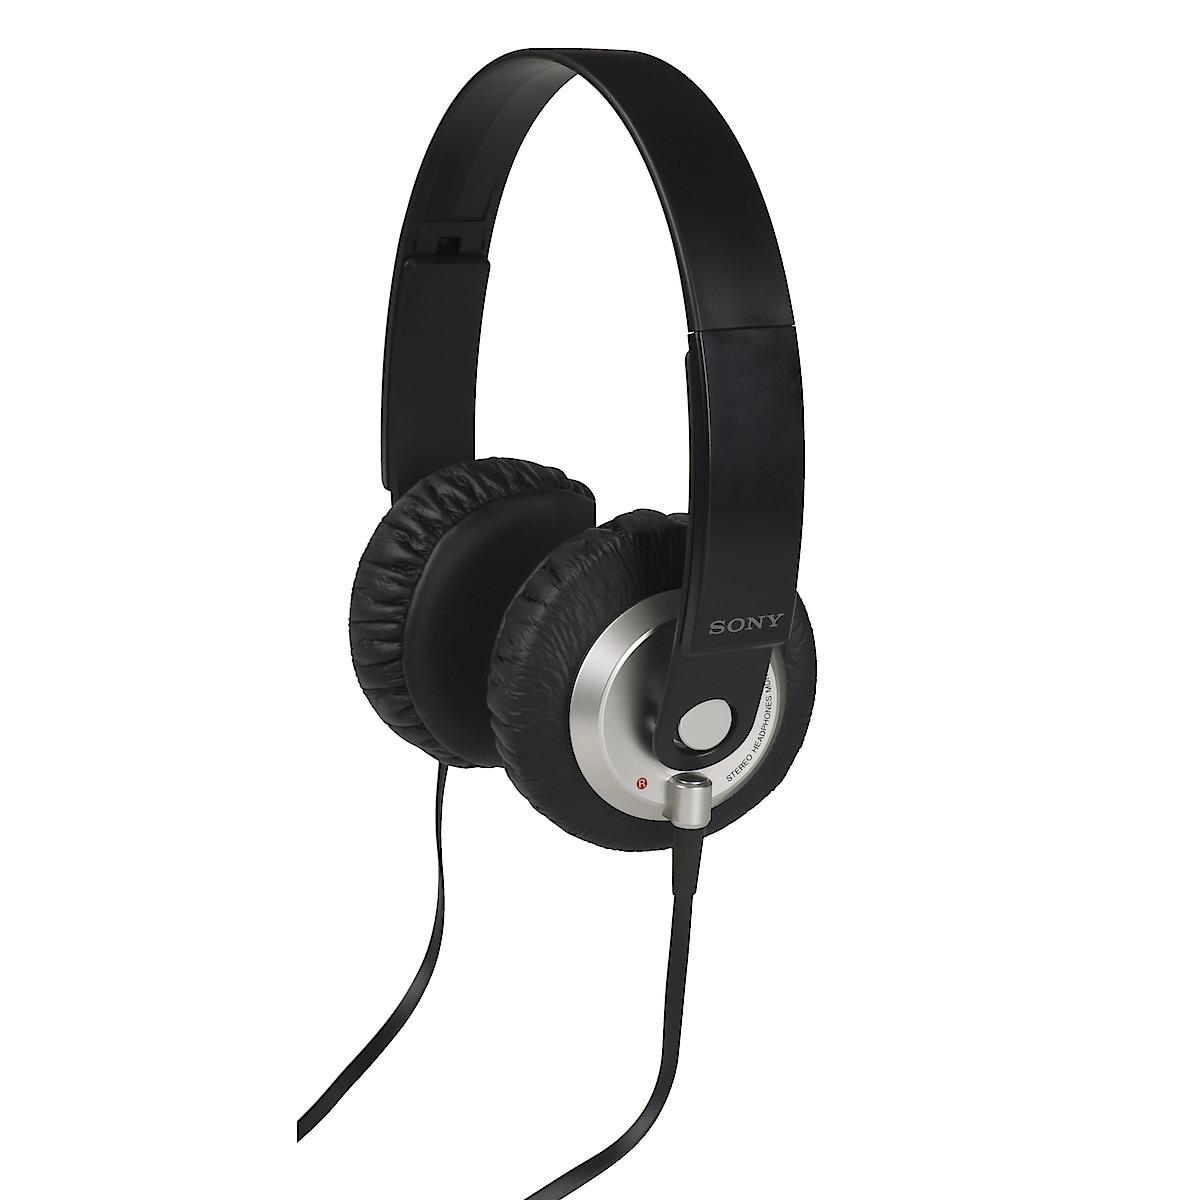 Sony MDR-XB300 headset